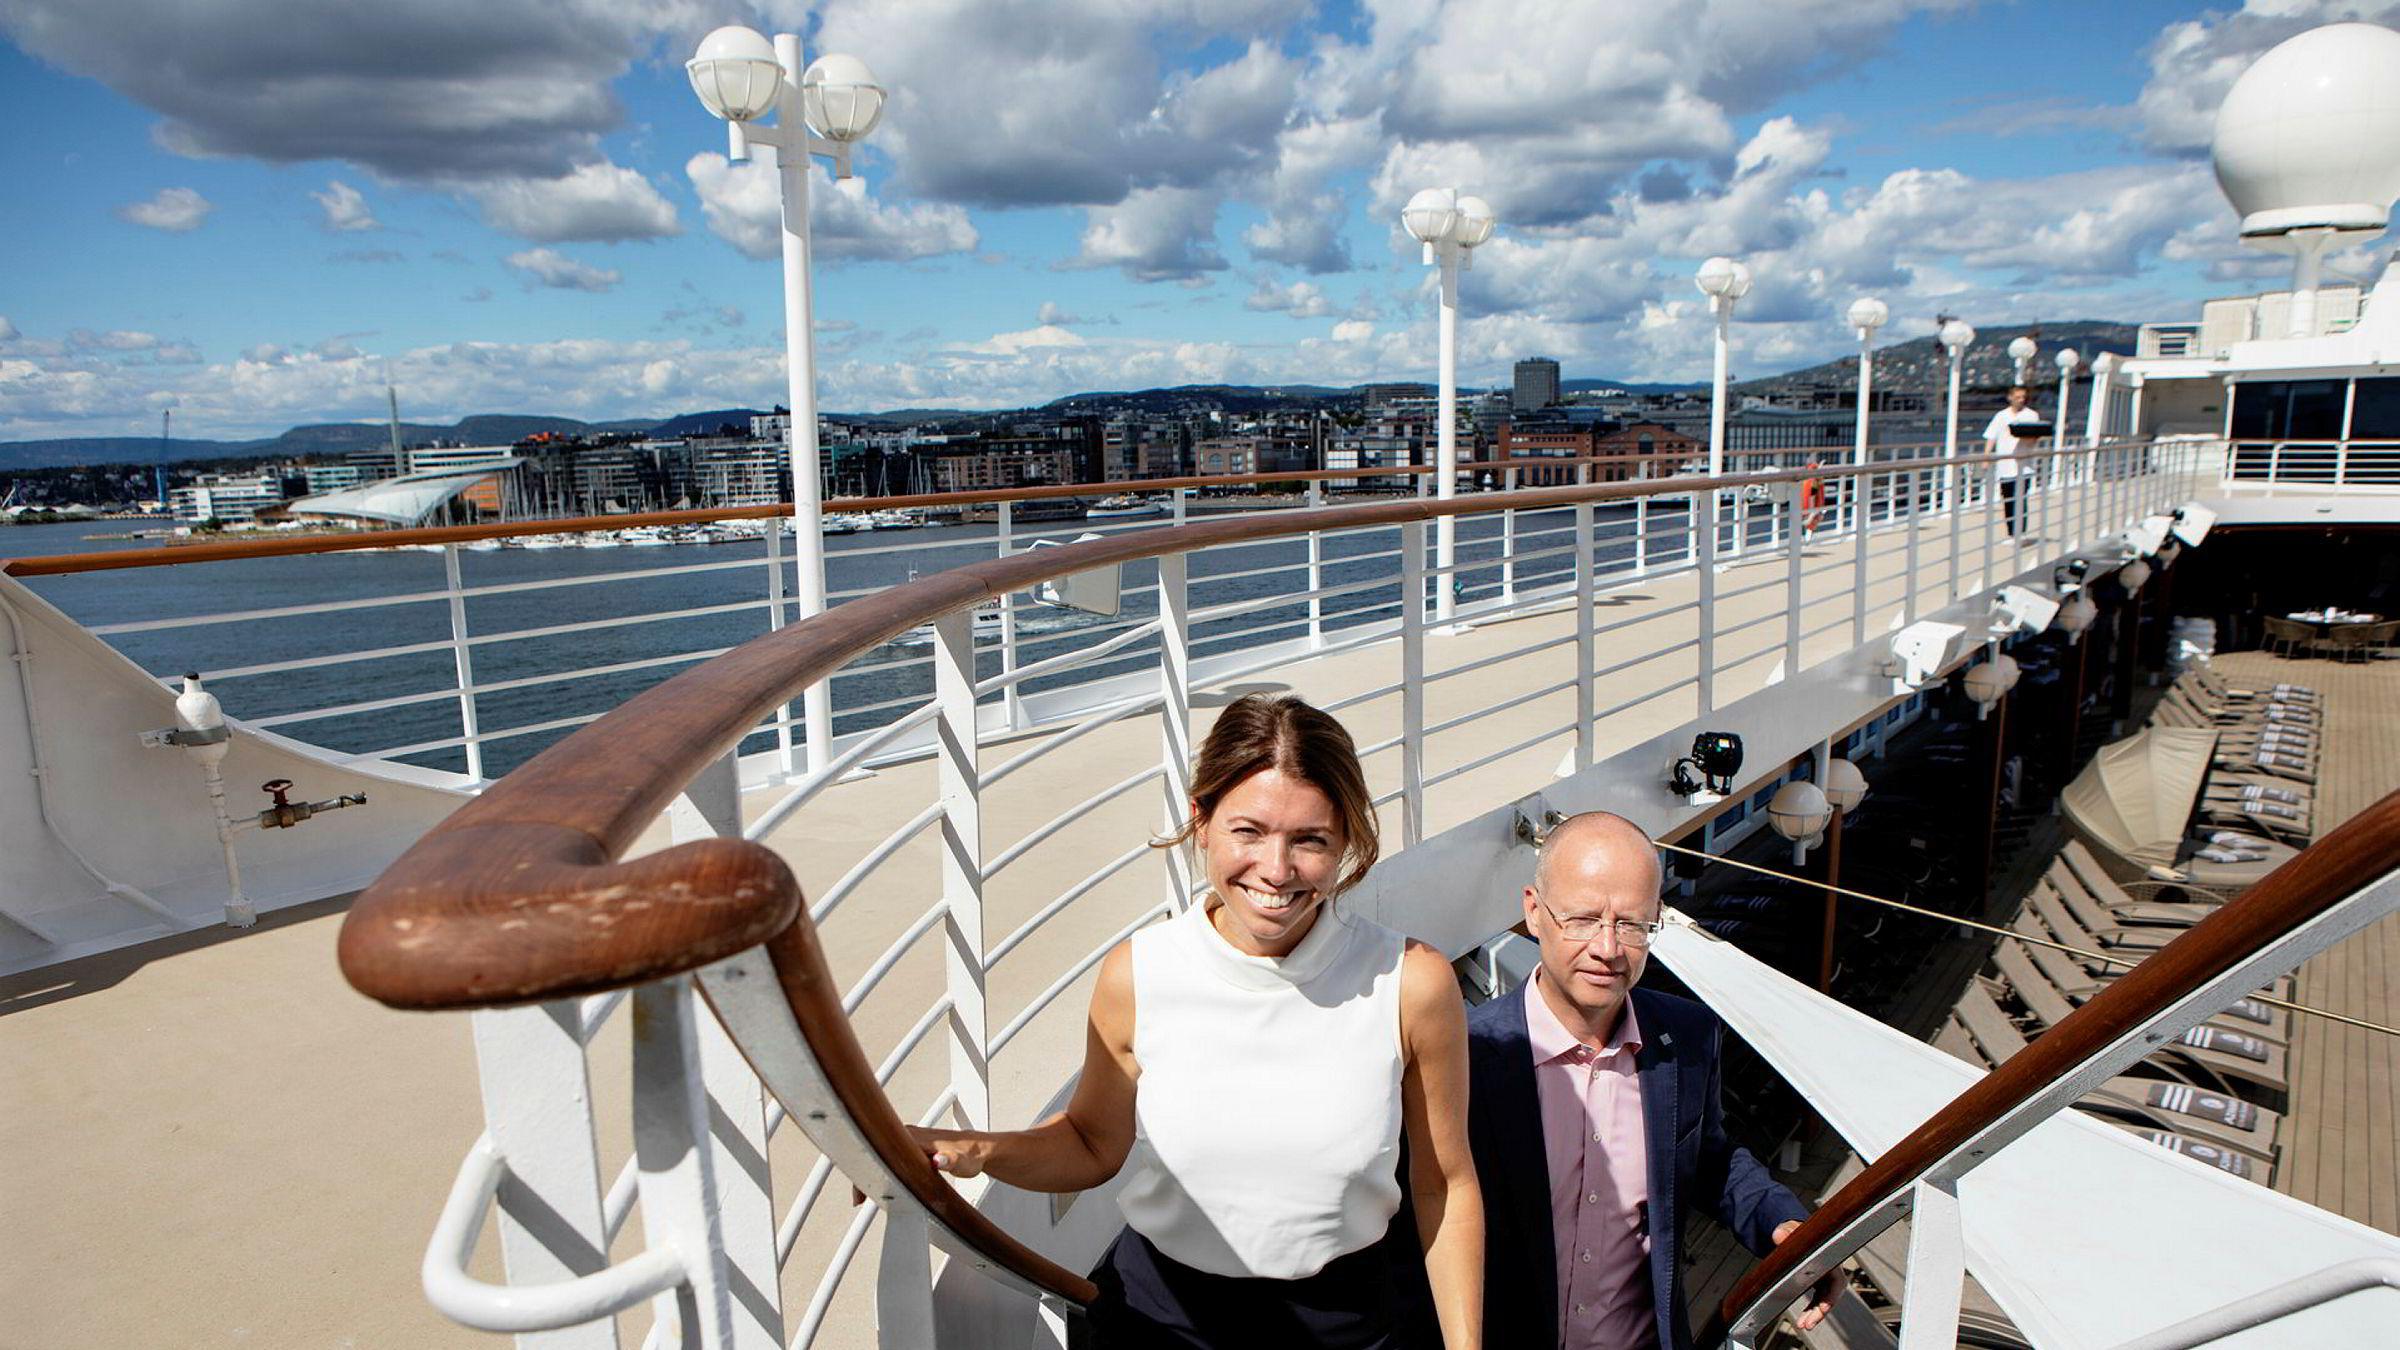 RCL-topp Julie Ødegaard og havnedirektør Ingvar Meyer Mathisen om bord på cruiseskipet «Azamara Pursuit» som ankom Oslo havn fredag.